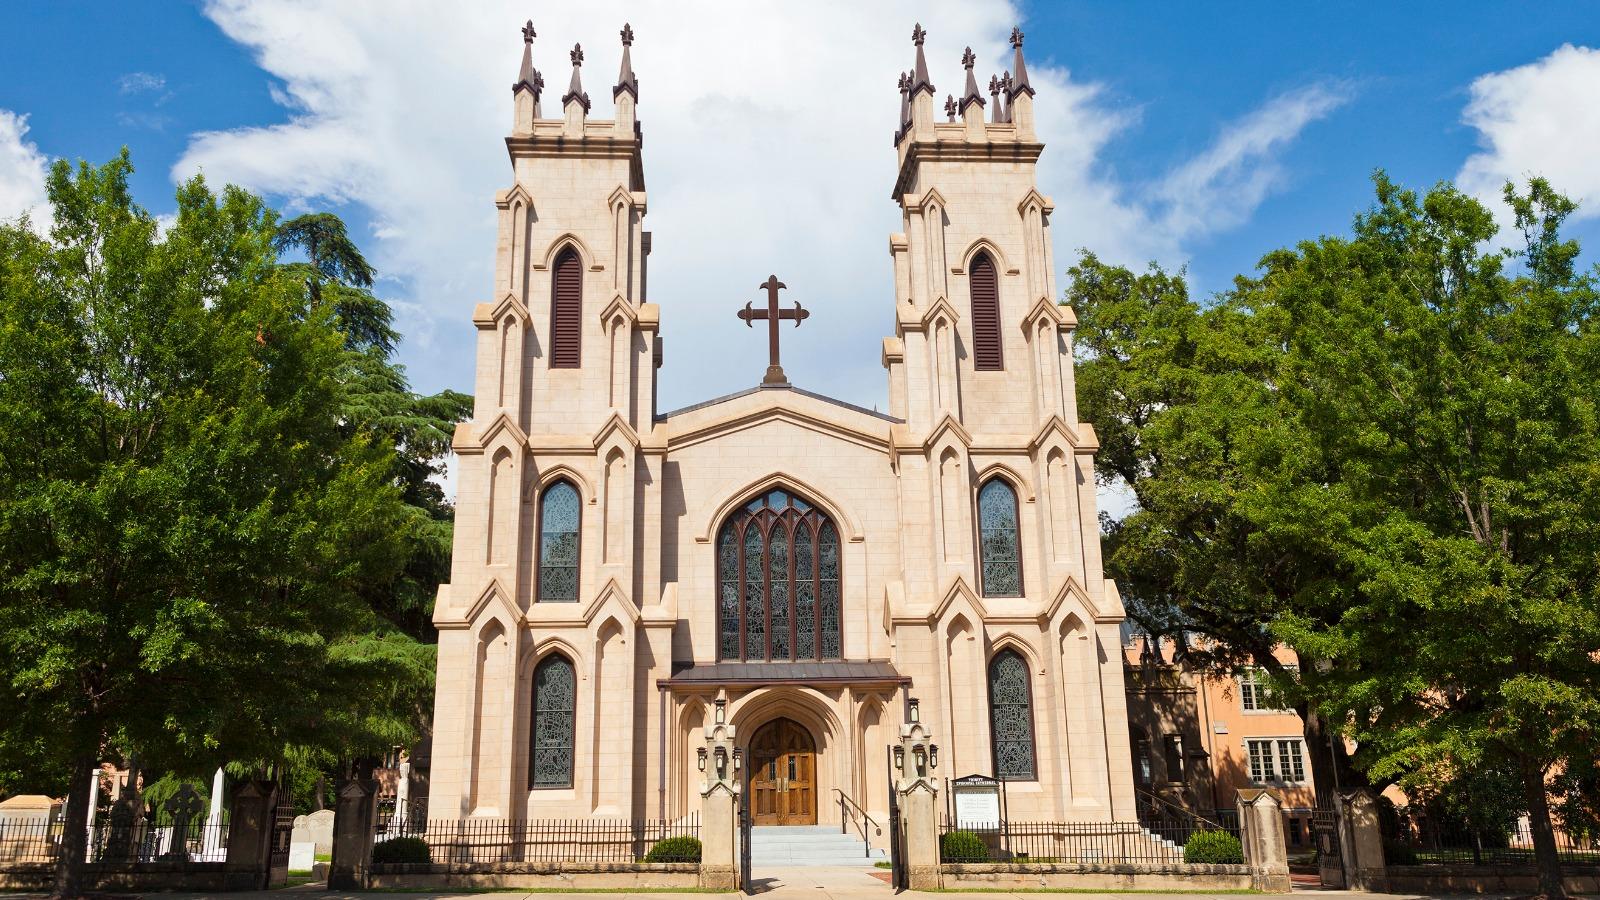 Churches accepting gay sex